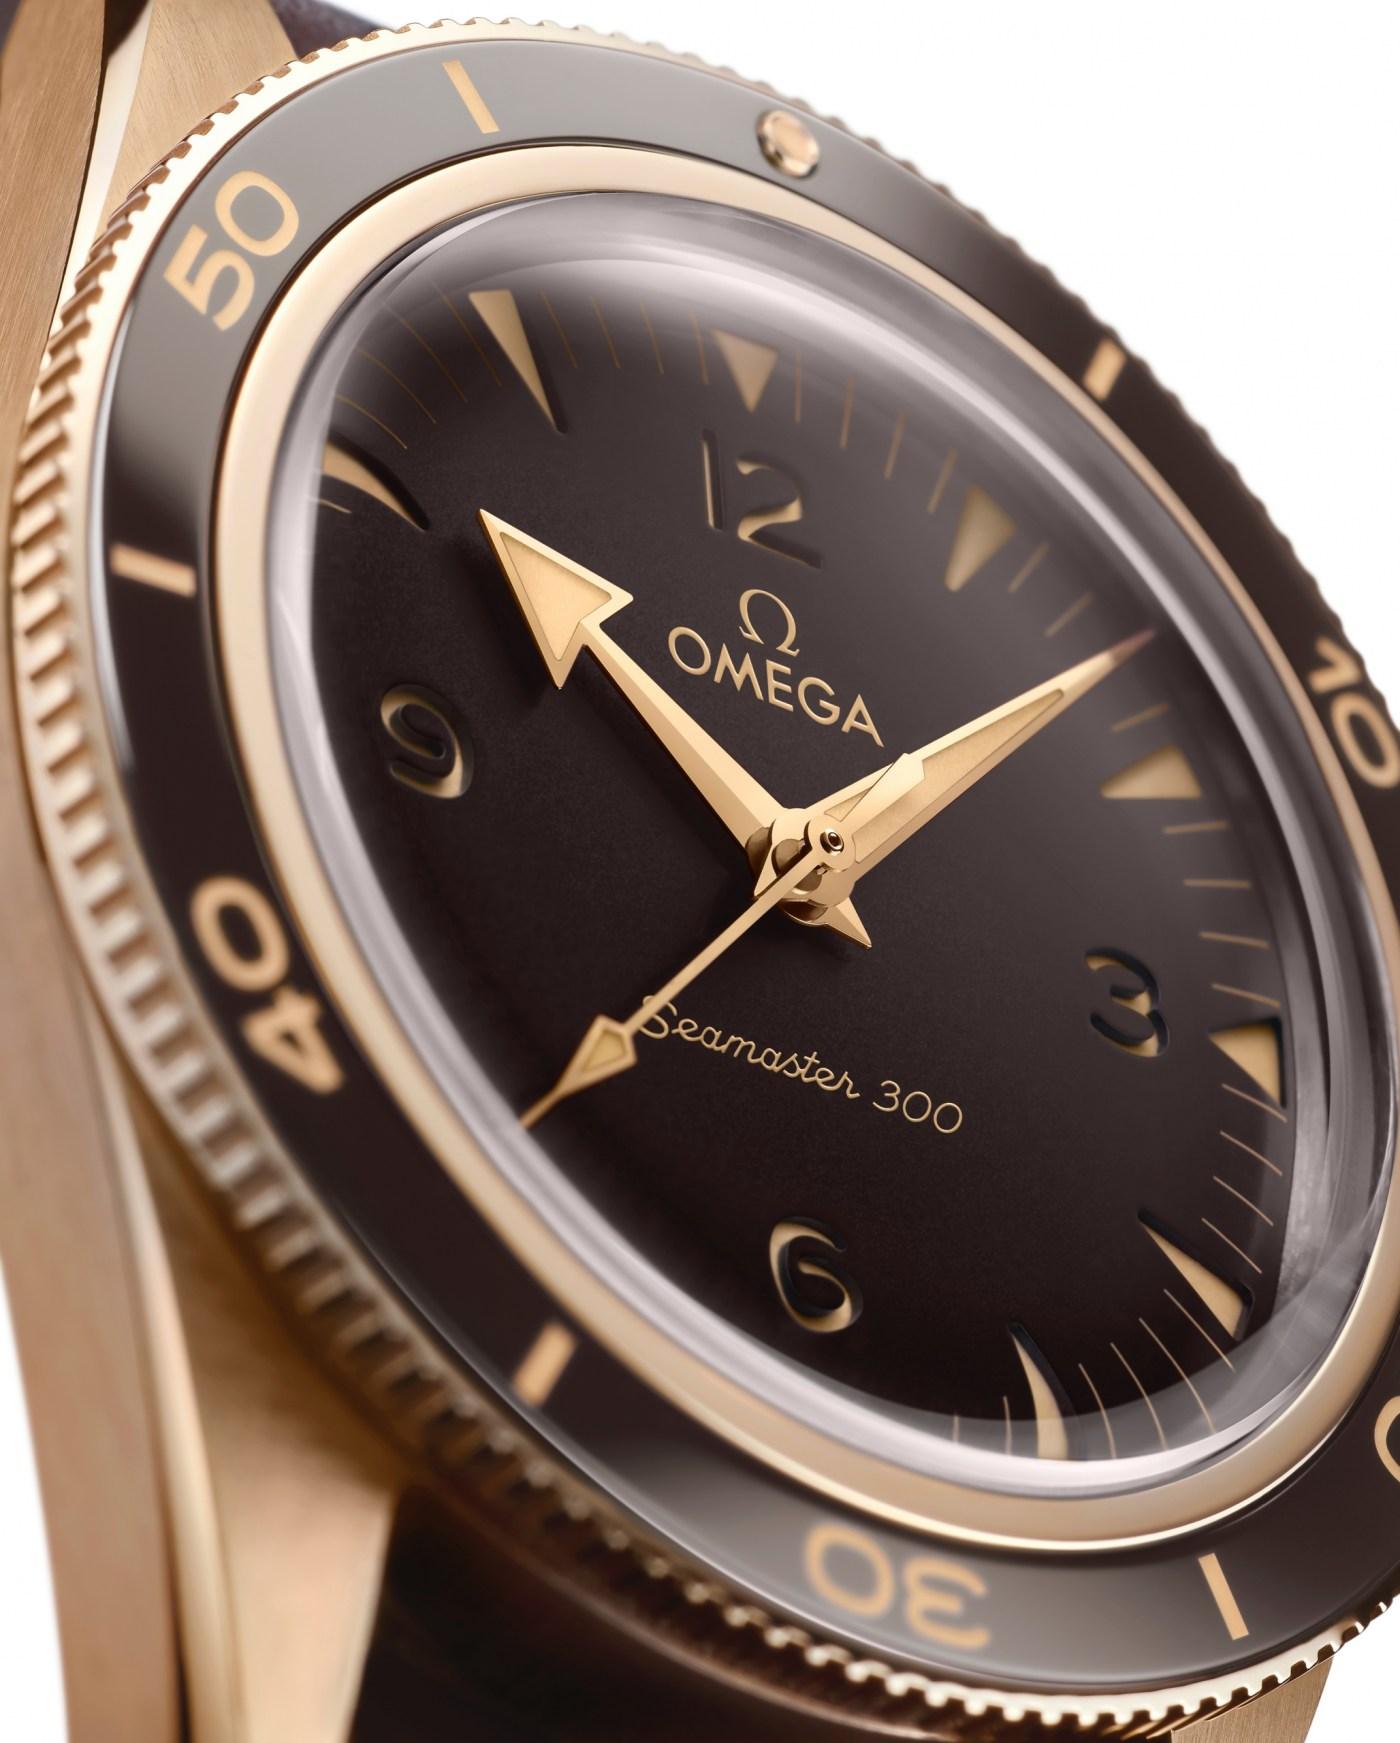 2021 Omega Seamaster 300 bronze gold dial close up